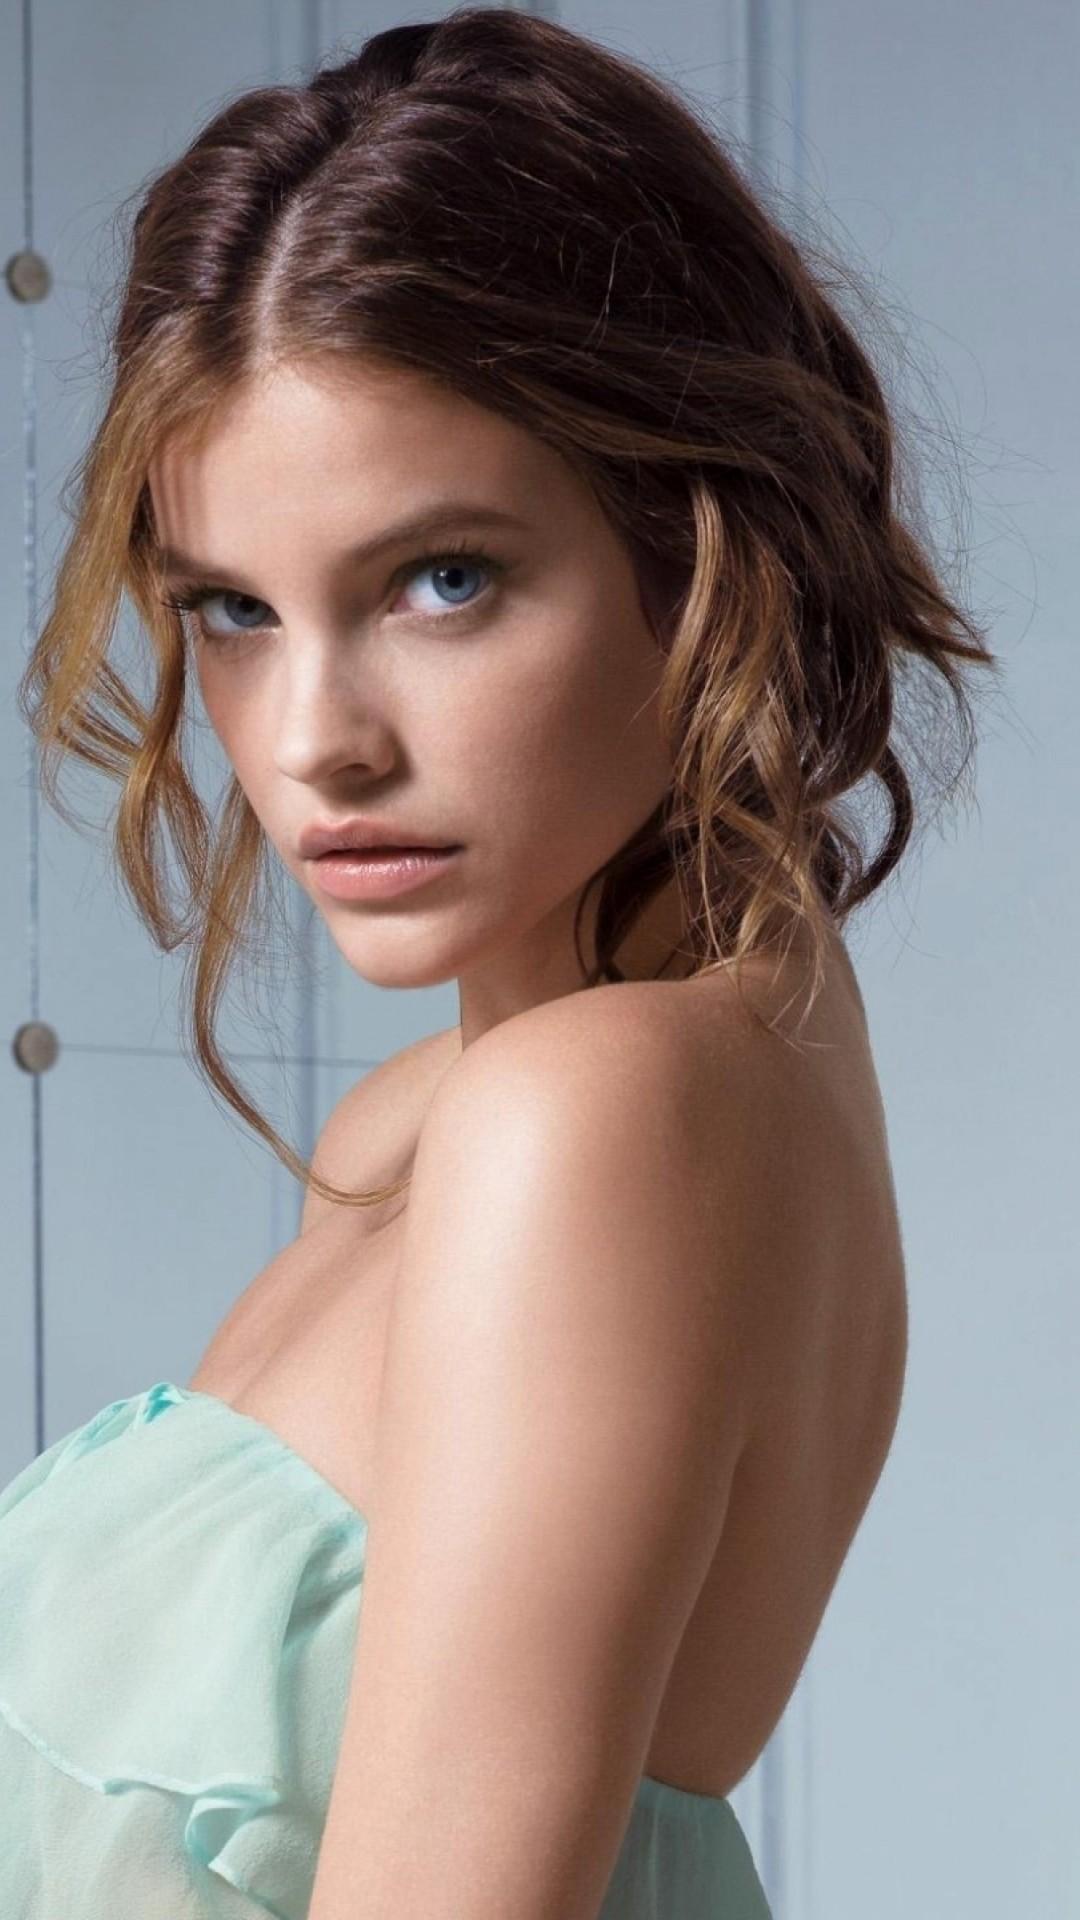 Angelic model